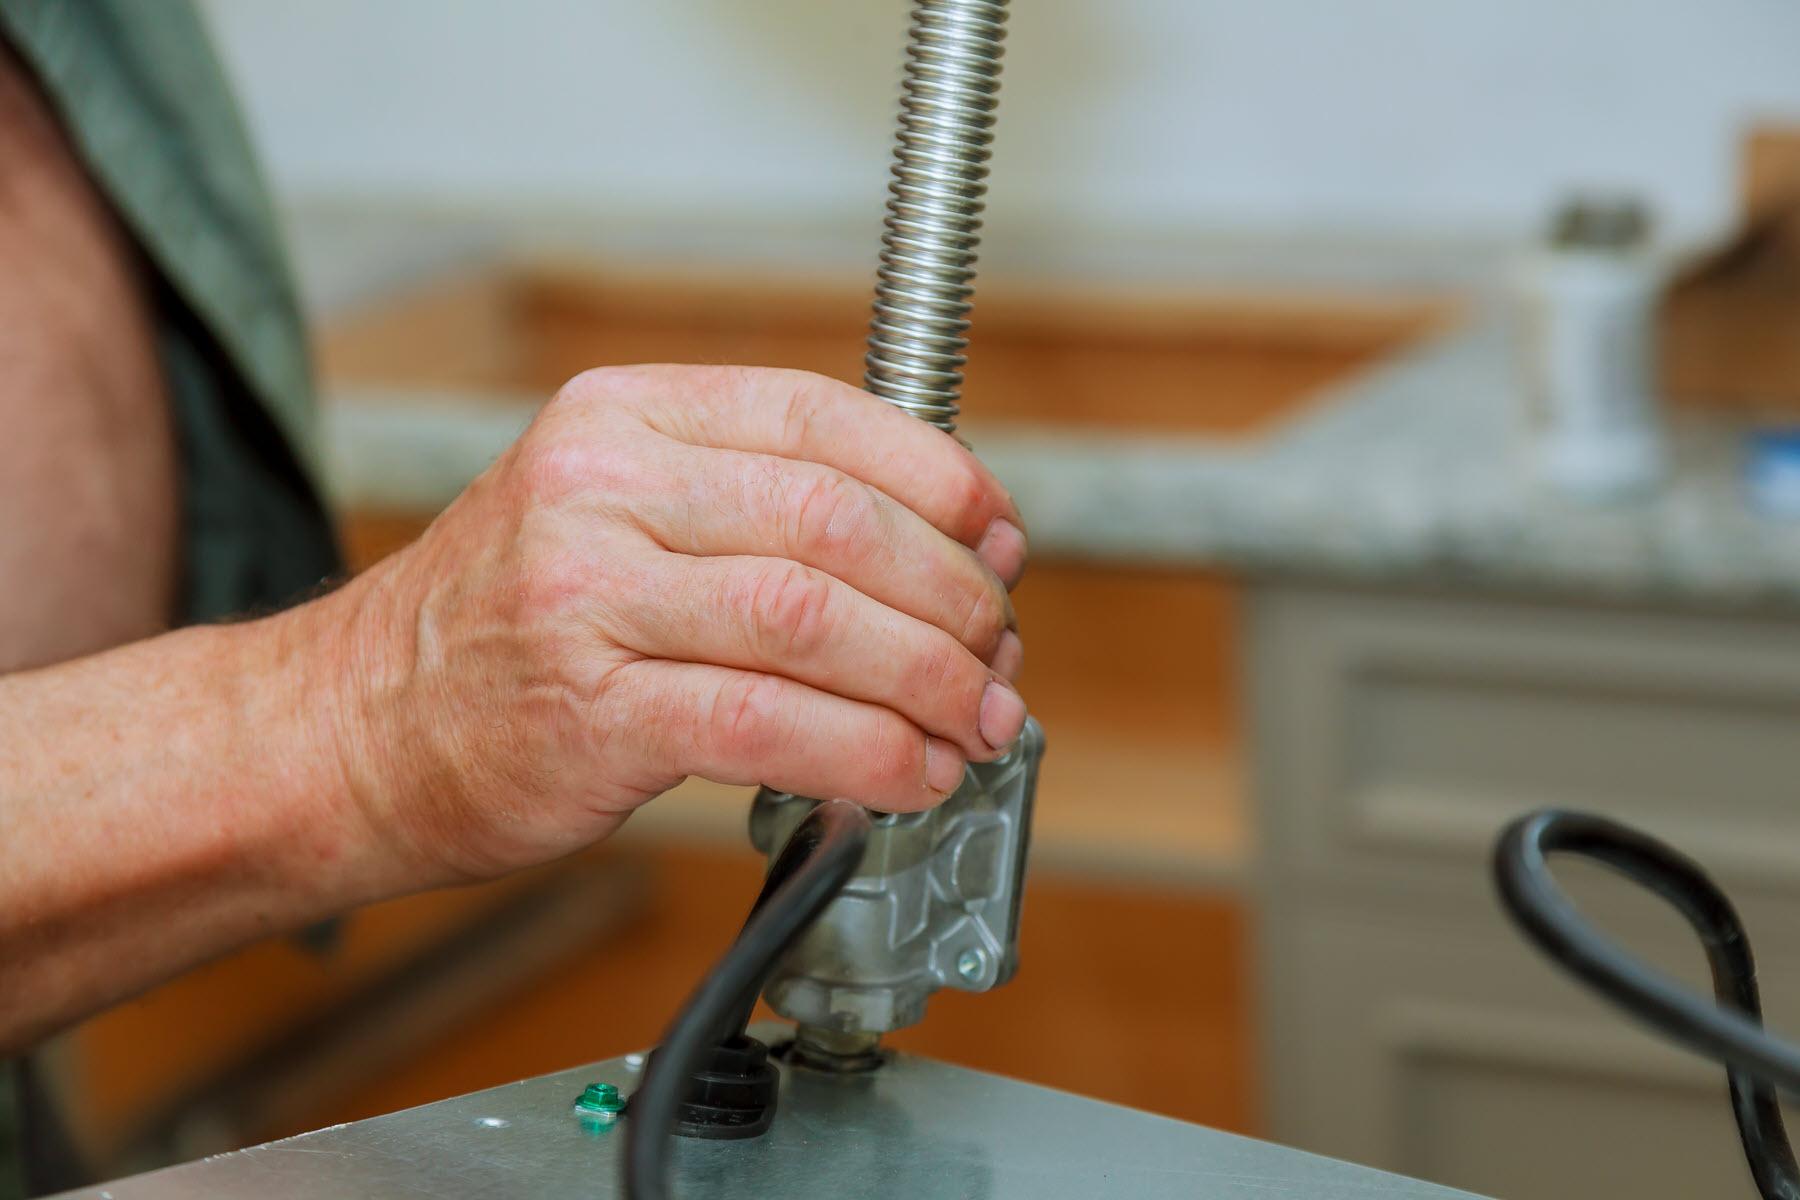 Repairing Major Appliances